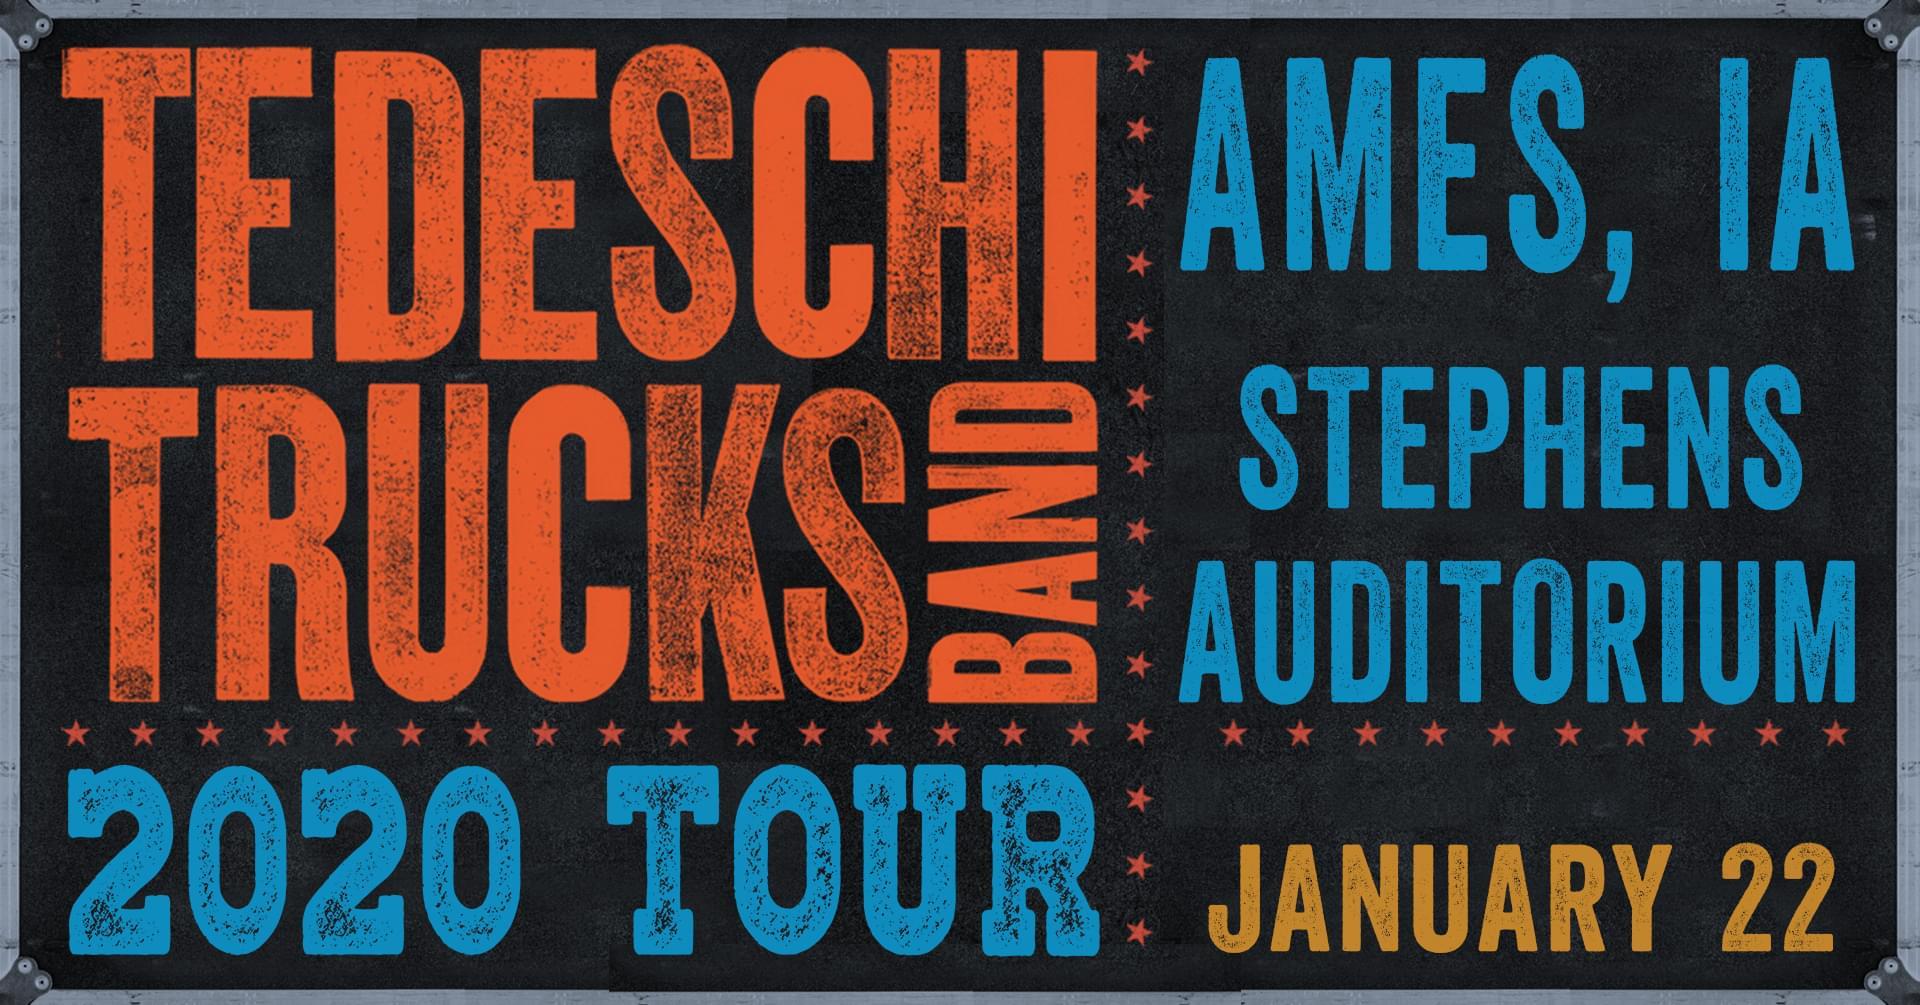 Tedeschi Trucks Band Contest